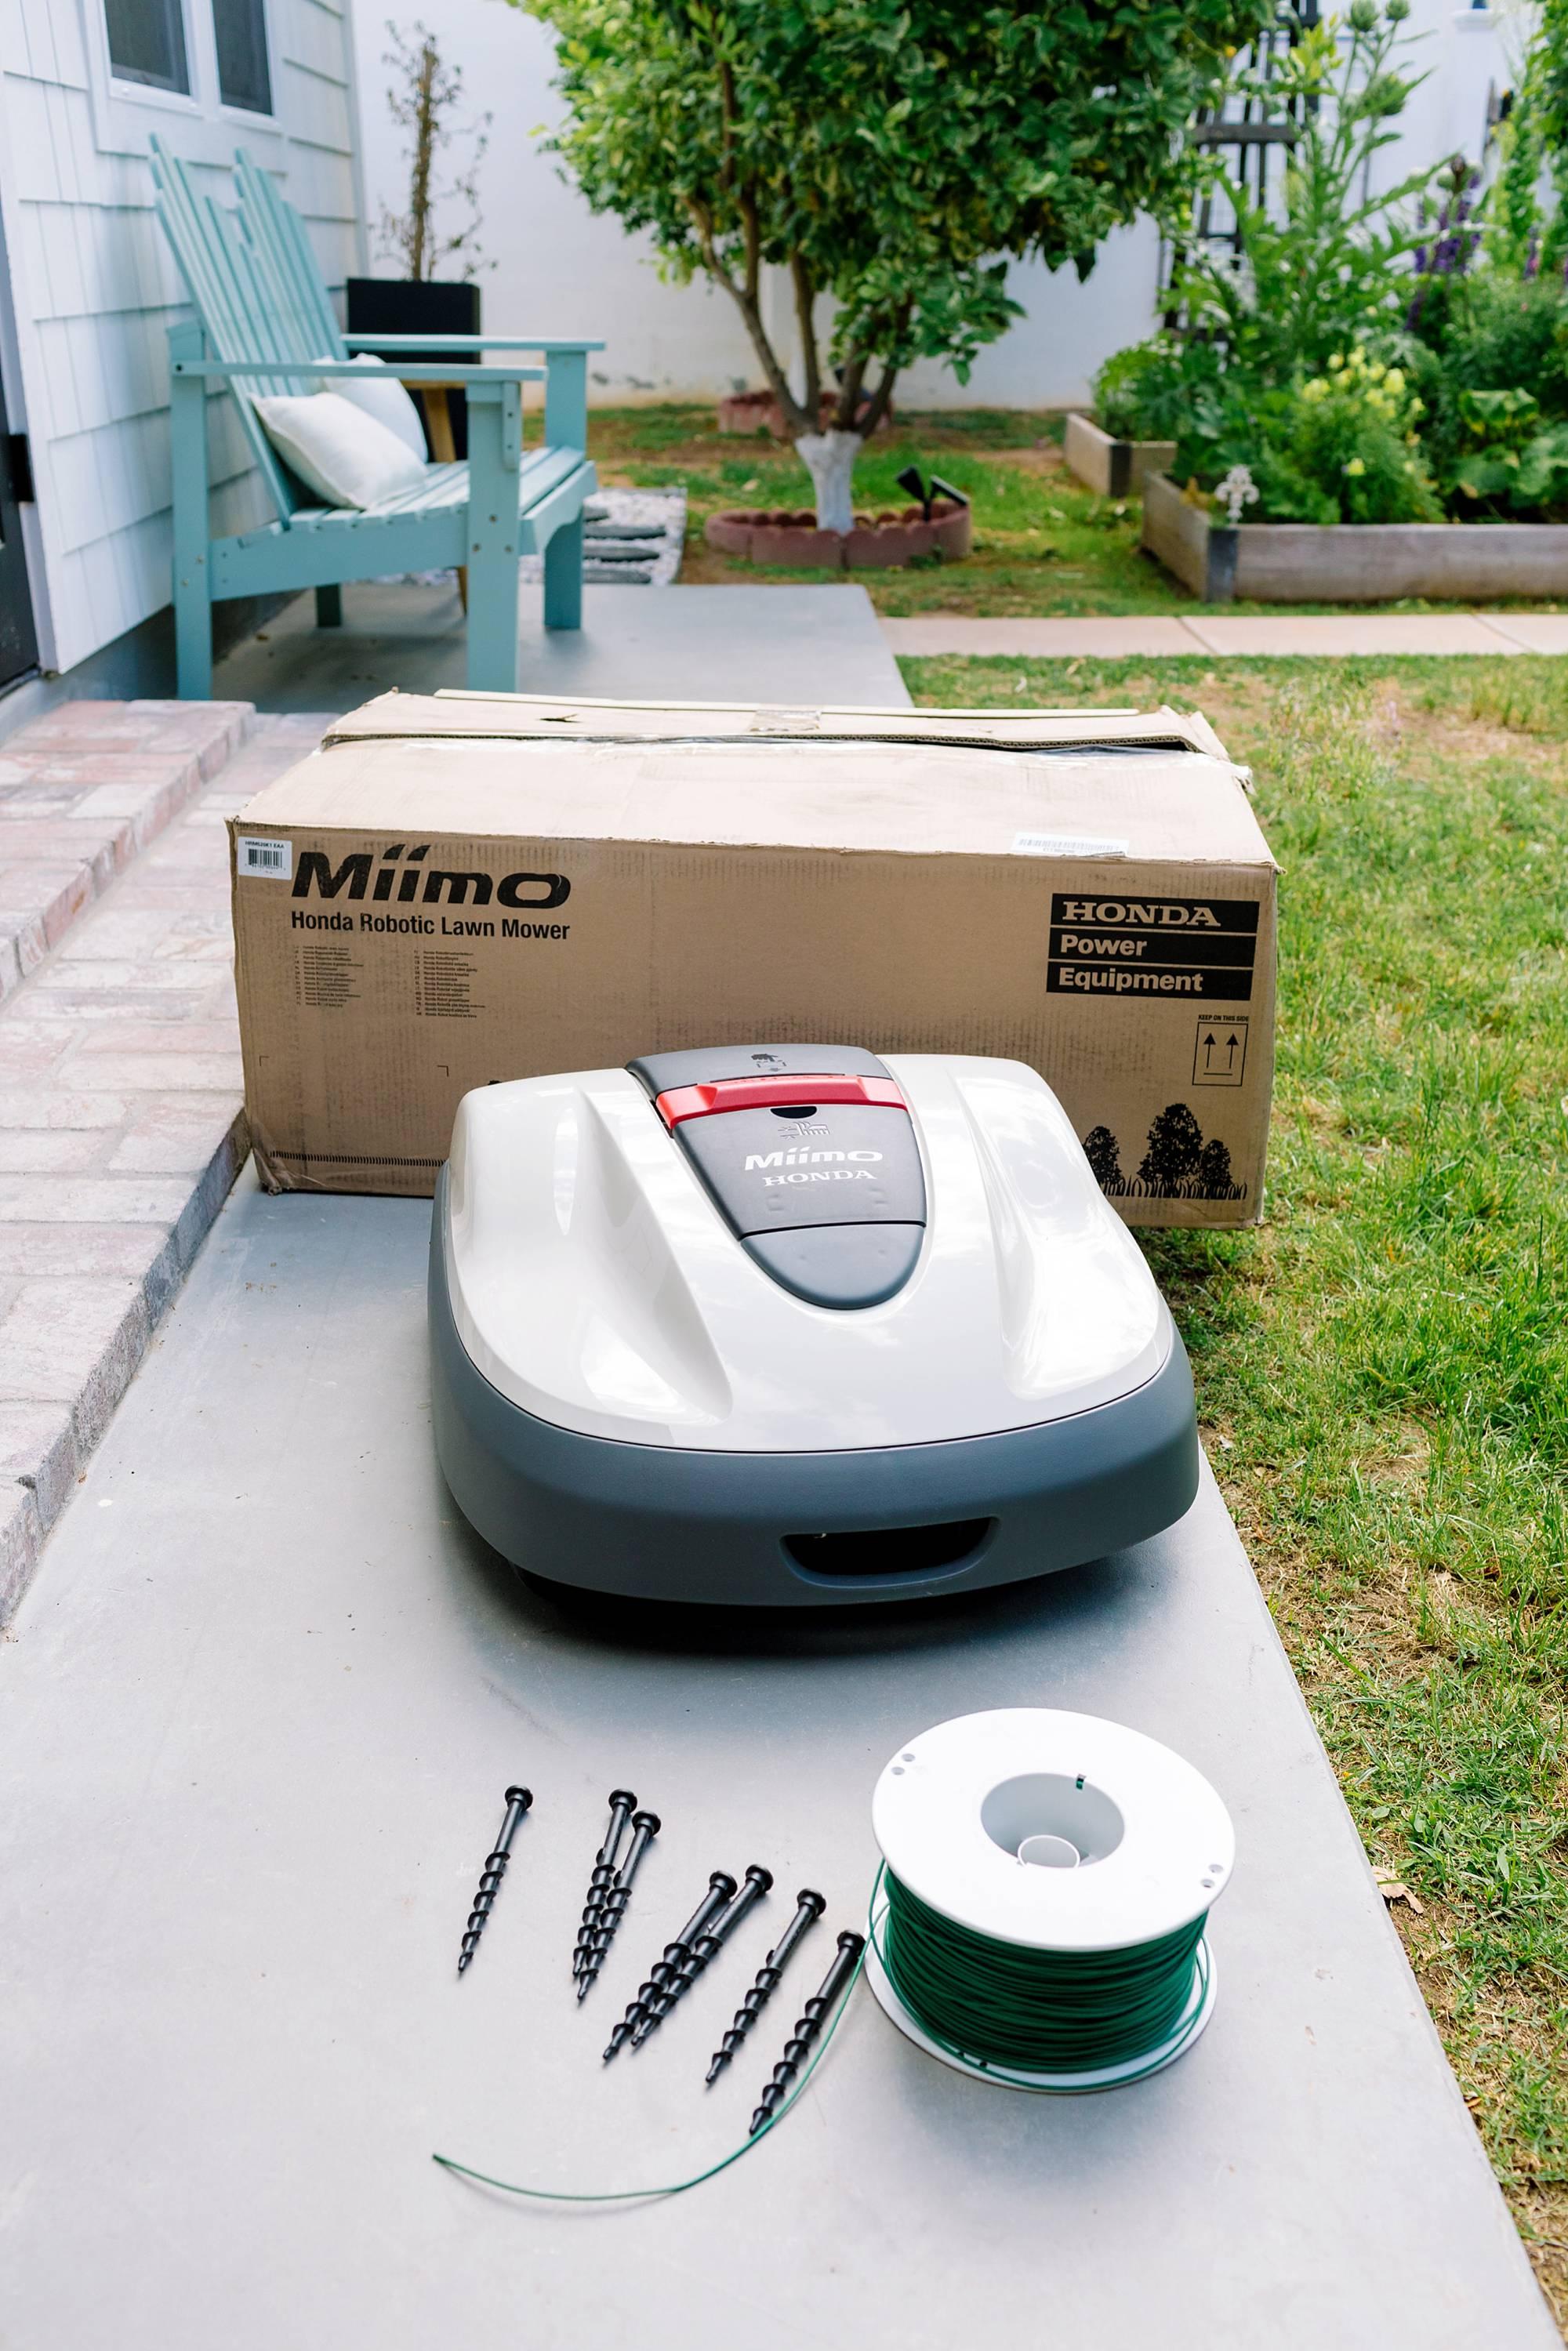 Robotic lawnmower Honda Miimo